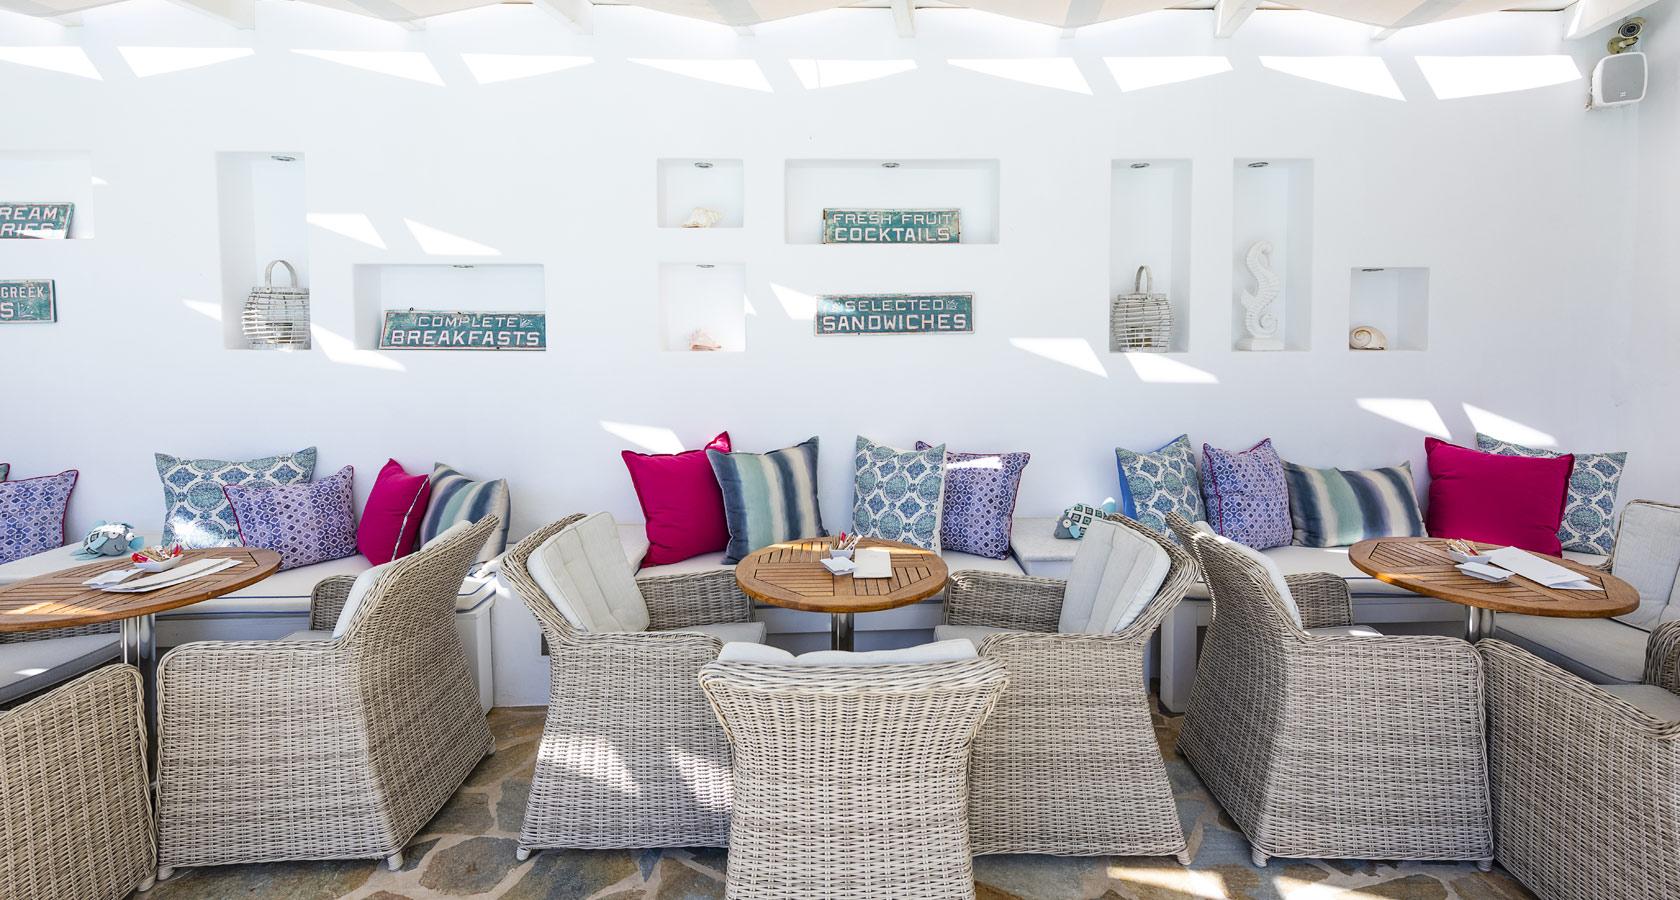 Stelia Mare Hotel Paros – Outdoor Jacuzzi